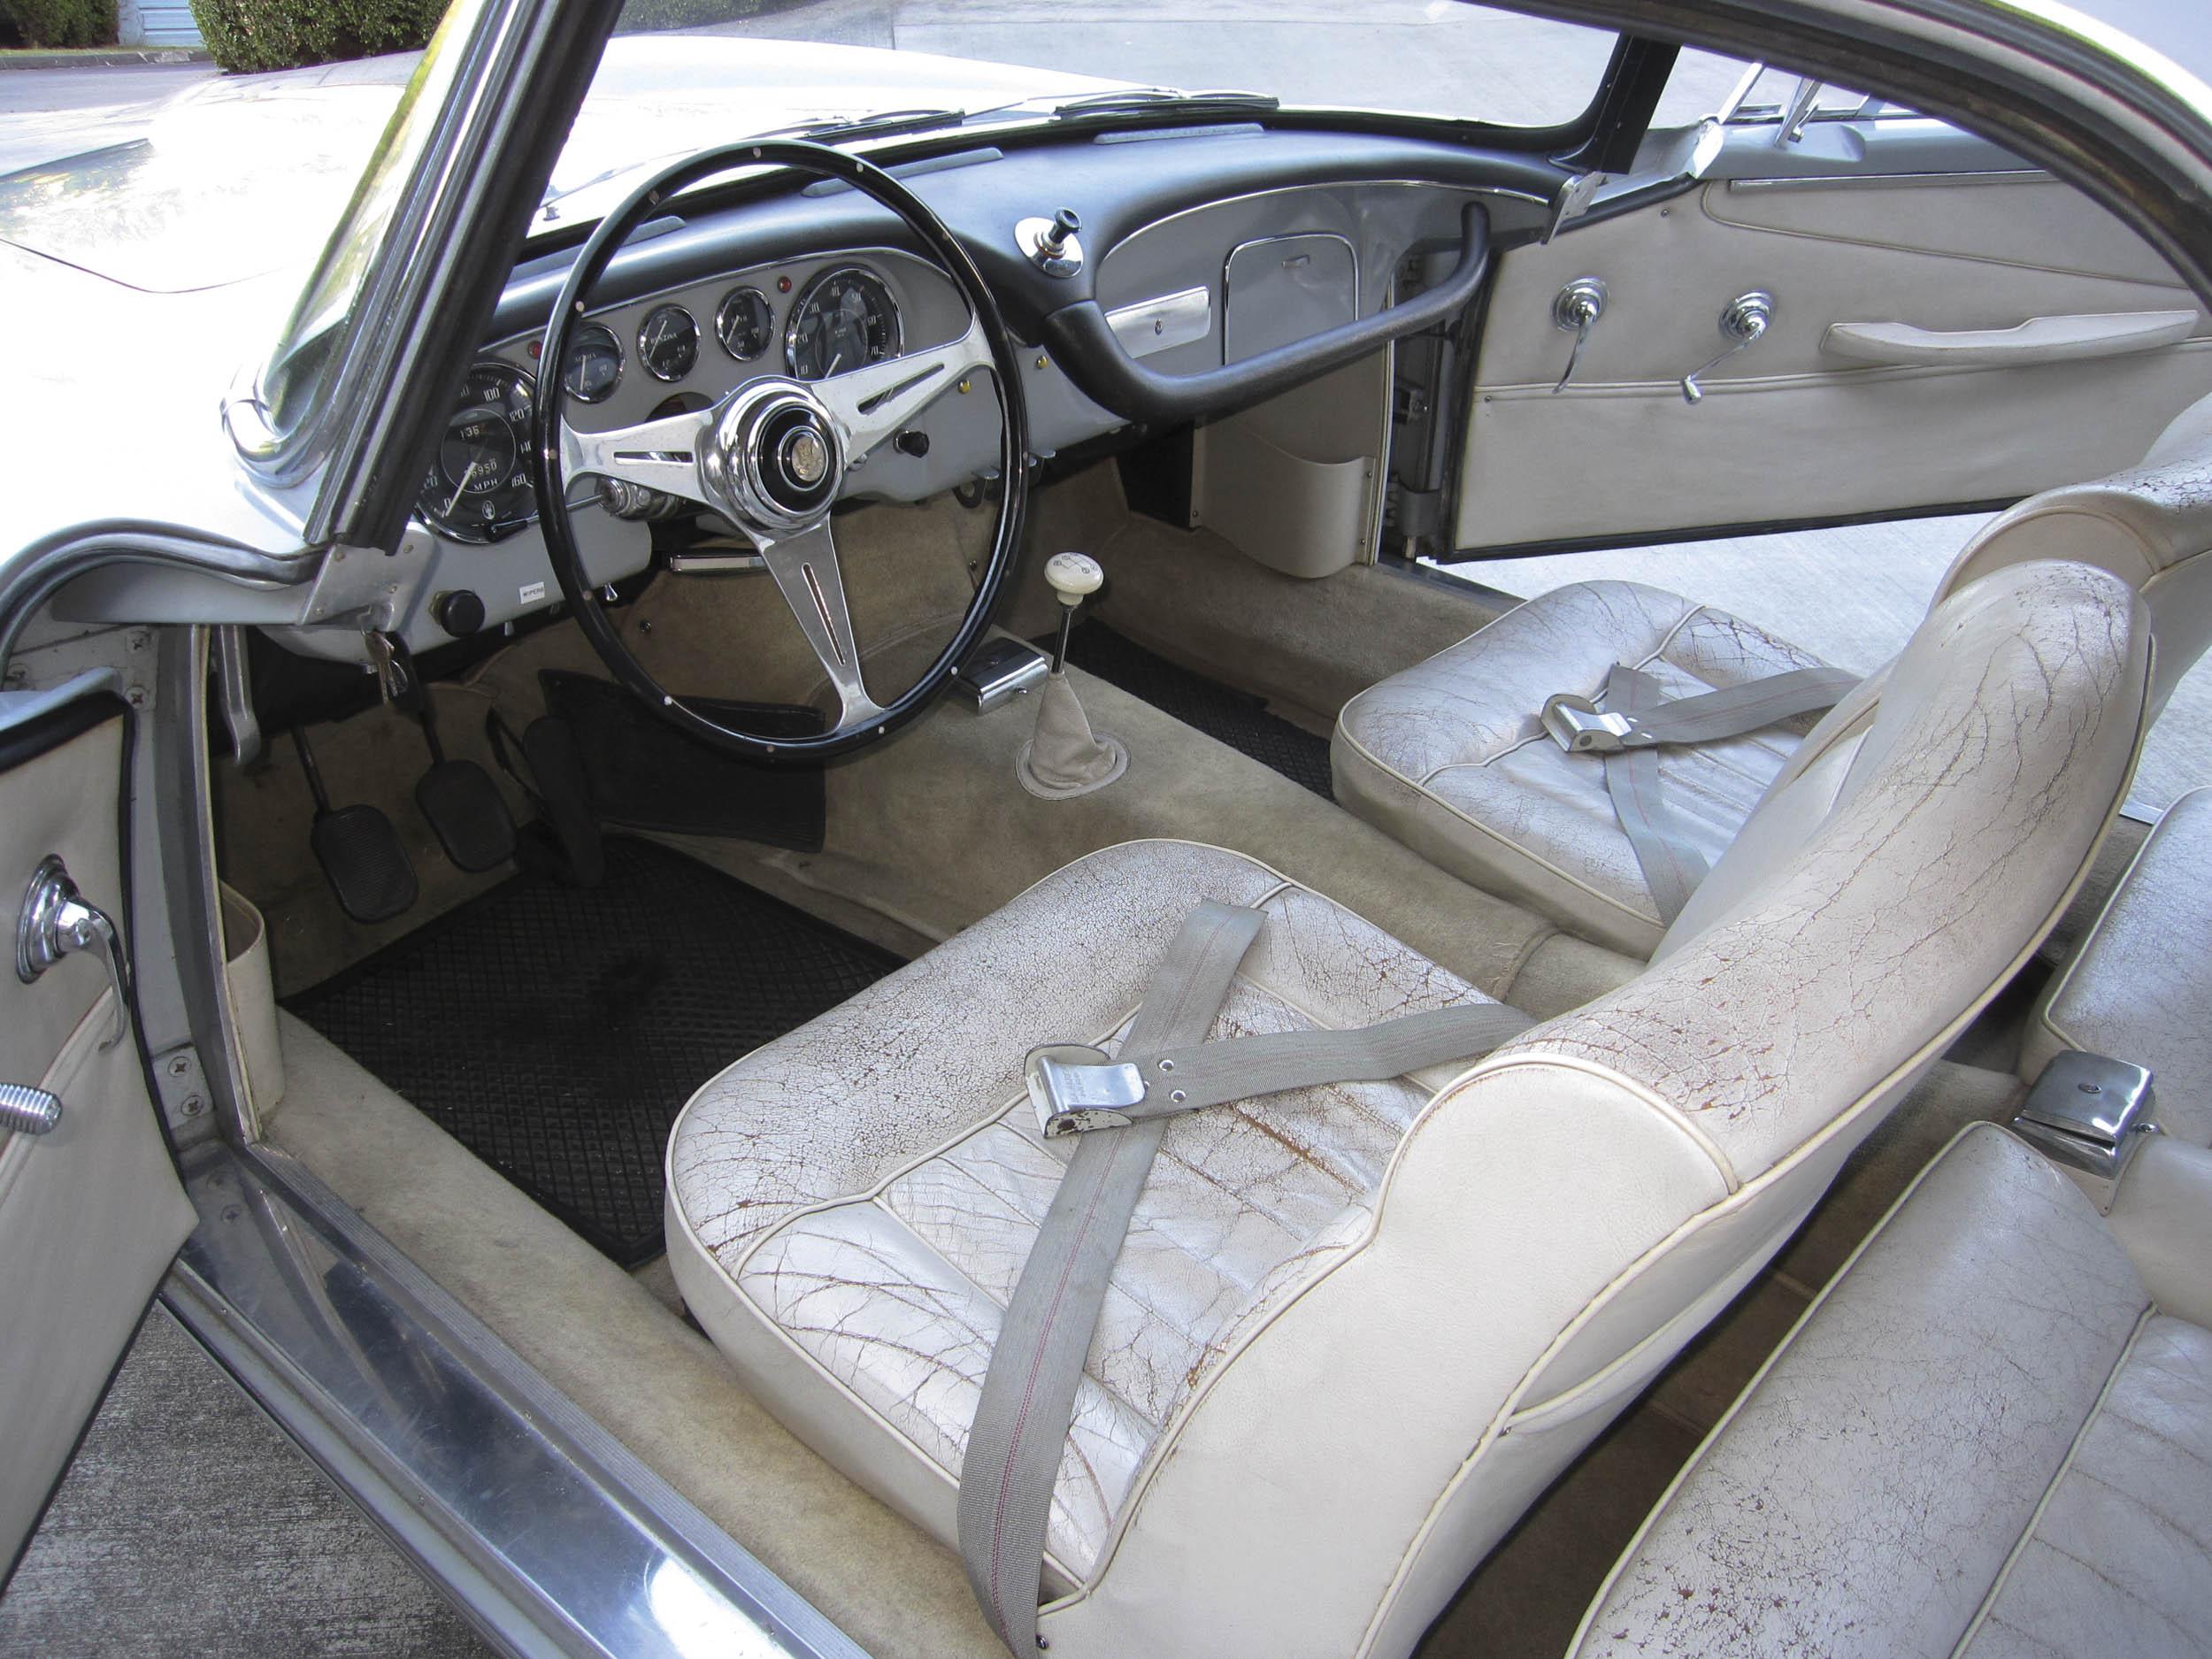 1959 Maserati 3500GT interior